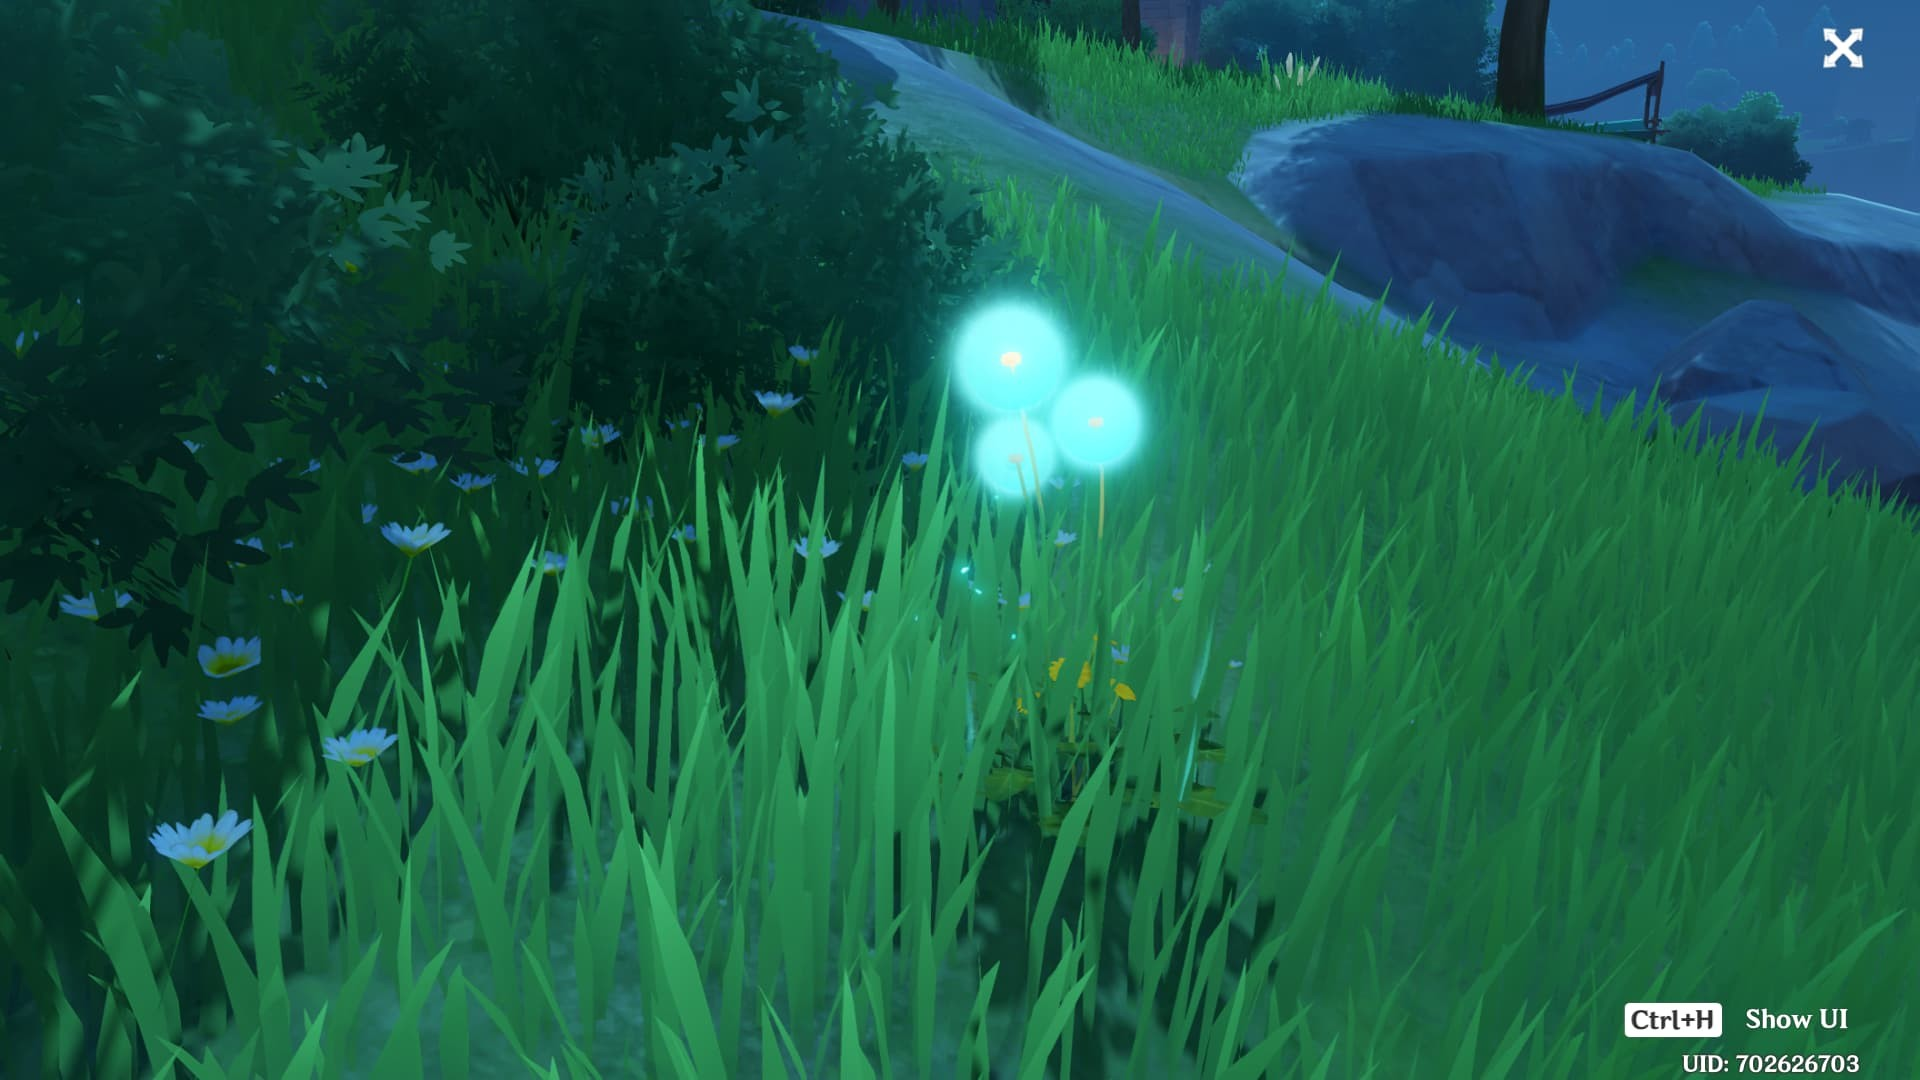 Genshin Impact Dandelion Seed